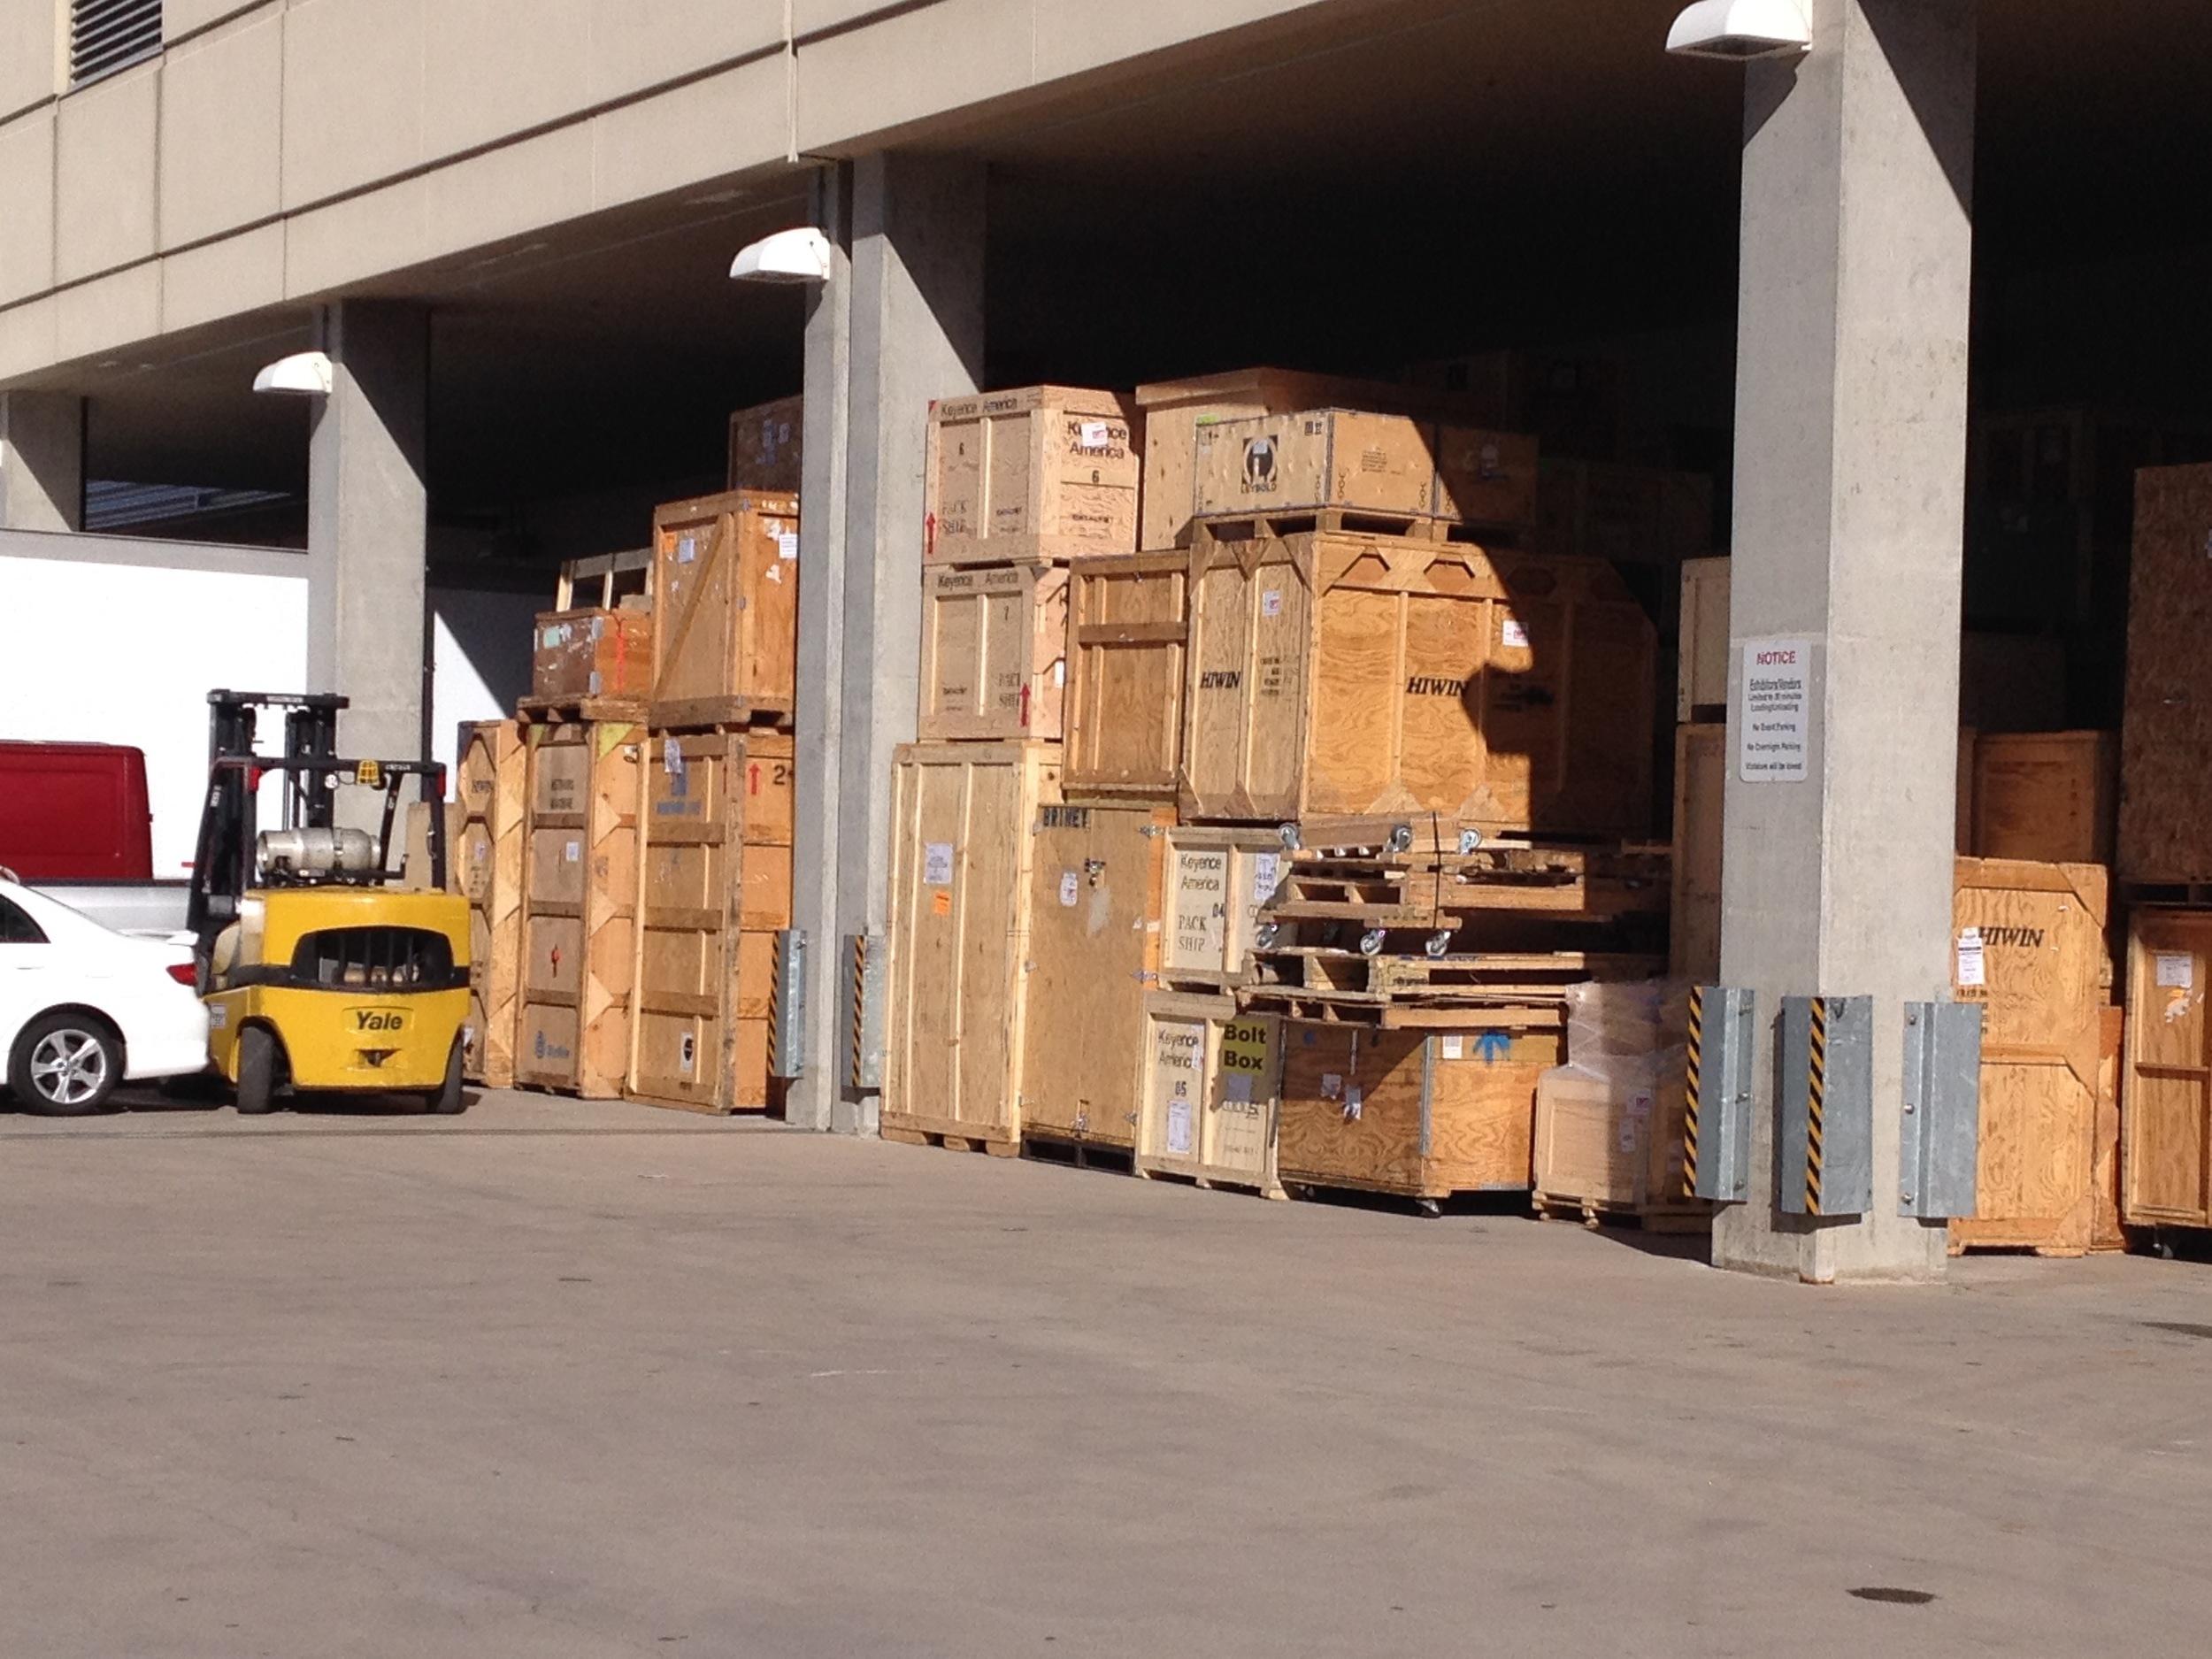 logistics-crates-on-loading-dock